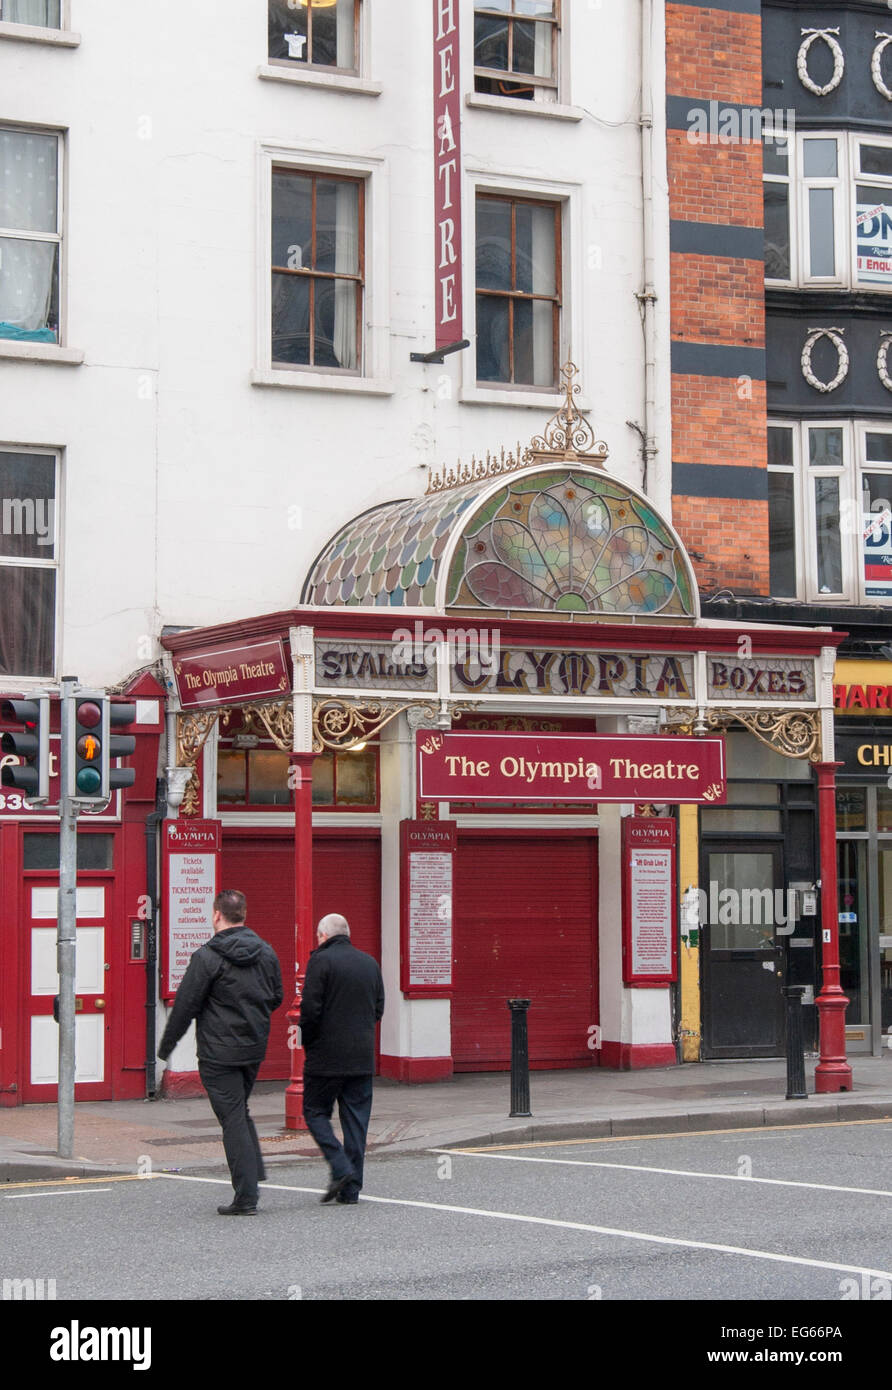 The Olympia Theatre on Dame Street in Dublin, Ireland Stock Photo